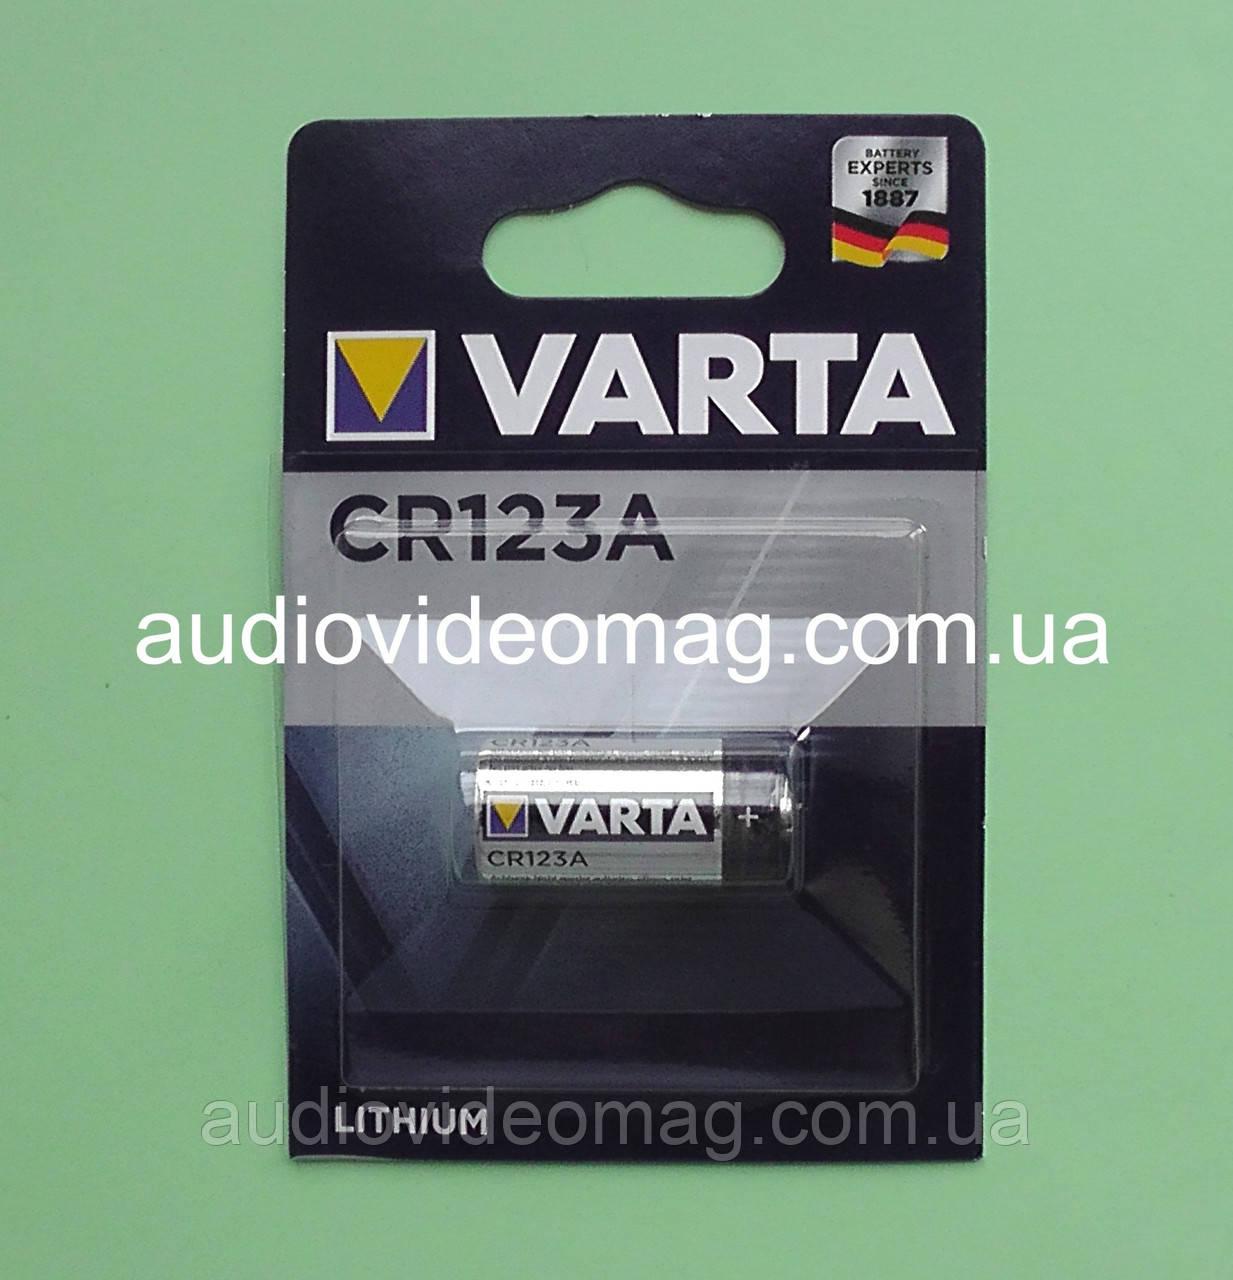 Батарейка литиевая Varta CR123A 3V Lihtium